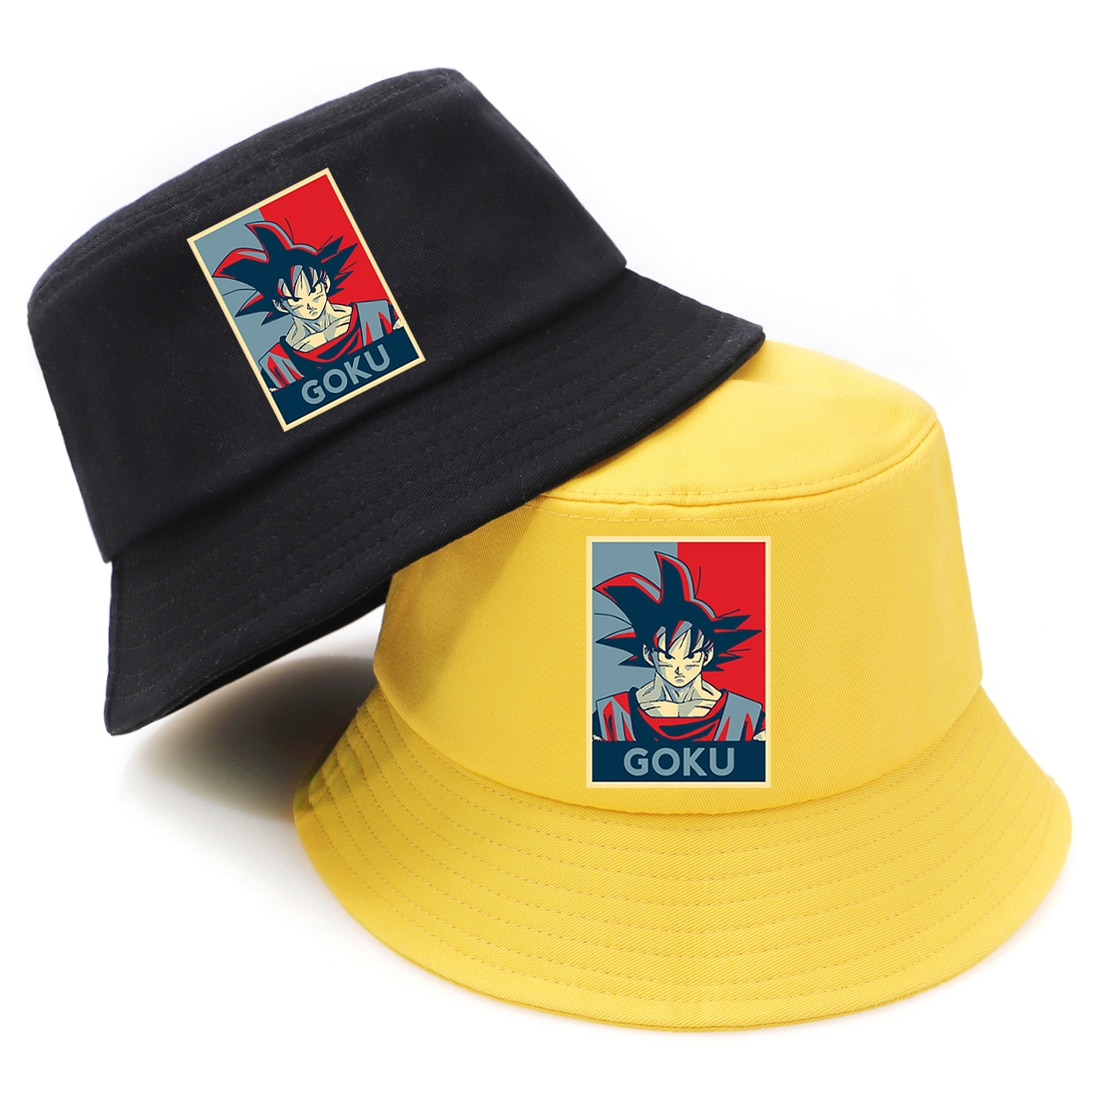 Sombrero de pescador con protección solar de Dragon Ball de Anime, sombrero de hombre, sombrero de cubo de Hip Hop, k-pop gorra de pesca, moda femenina, sombreros de Bob negro